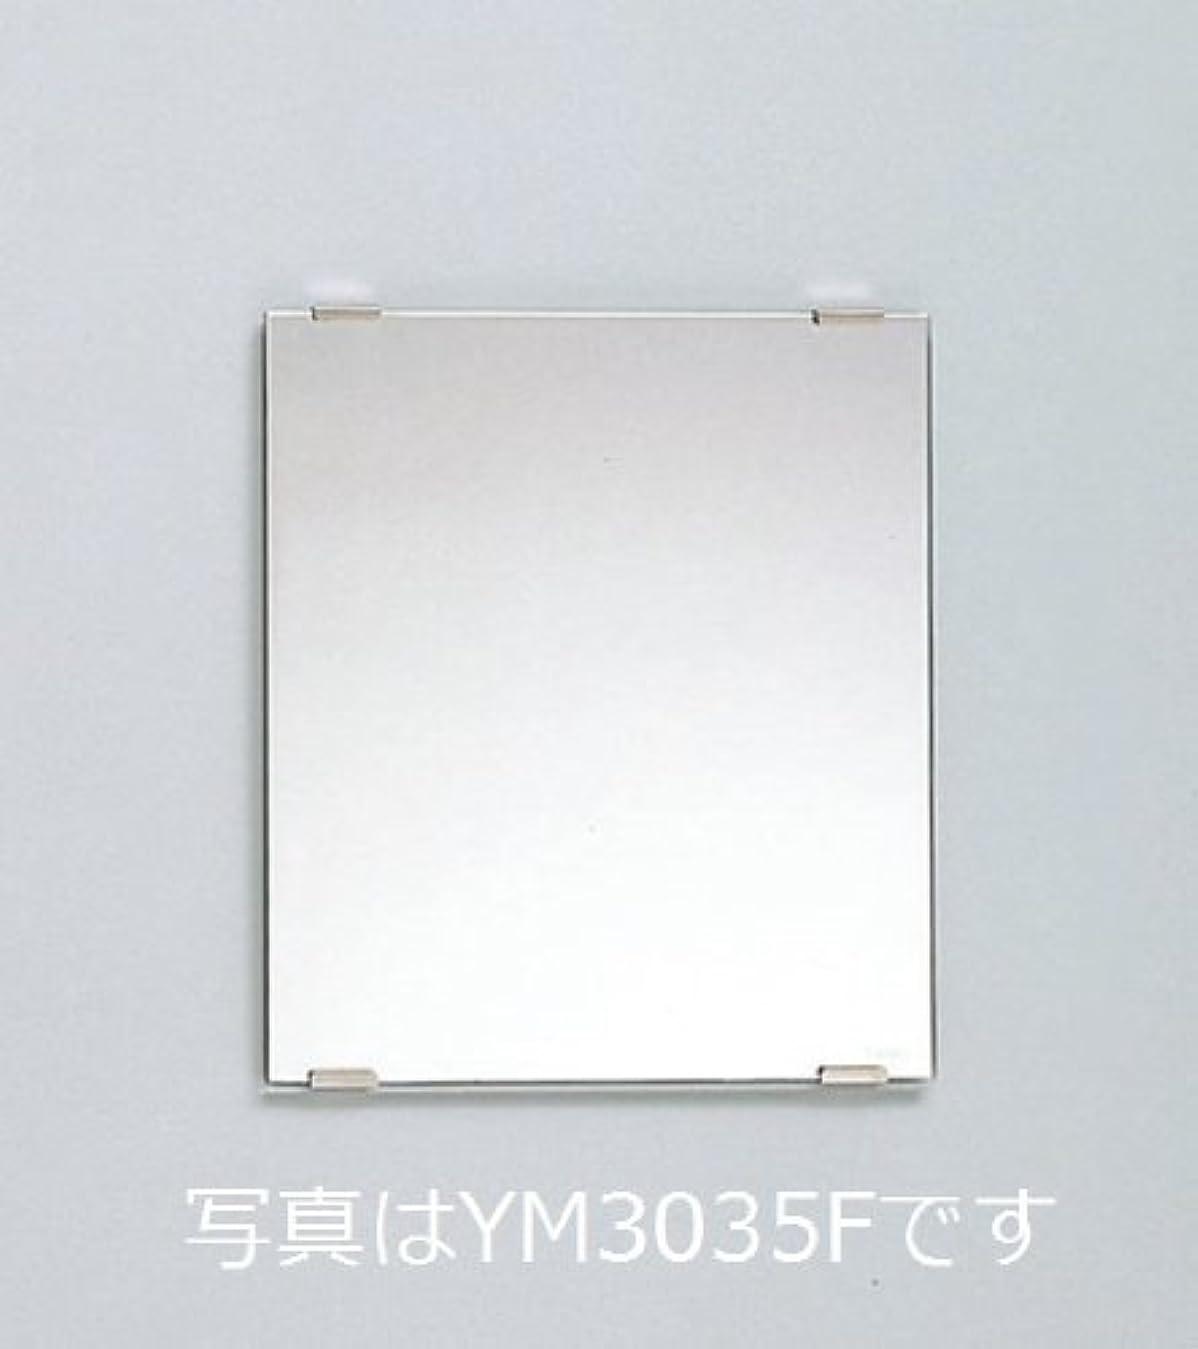 夕食を作る民主党統治可能TOTO 化粧鏡 YM3560F 耐食鏡 角型 350×600(mm)